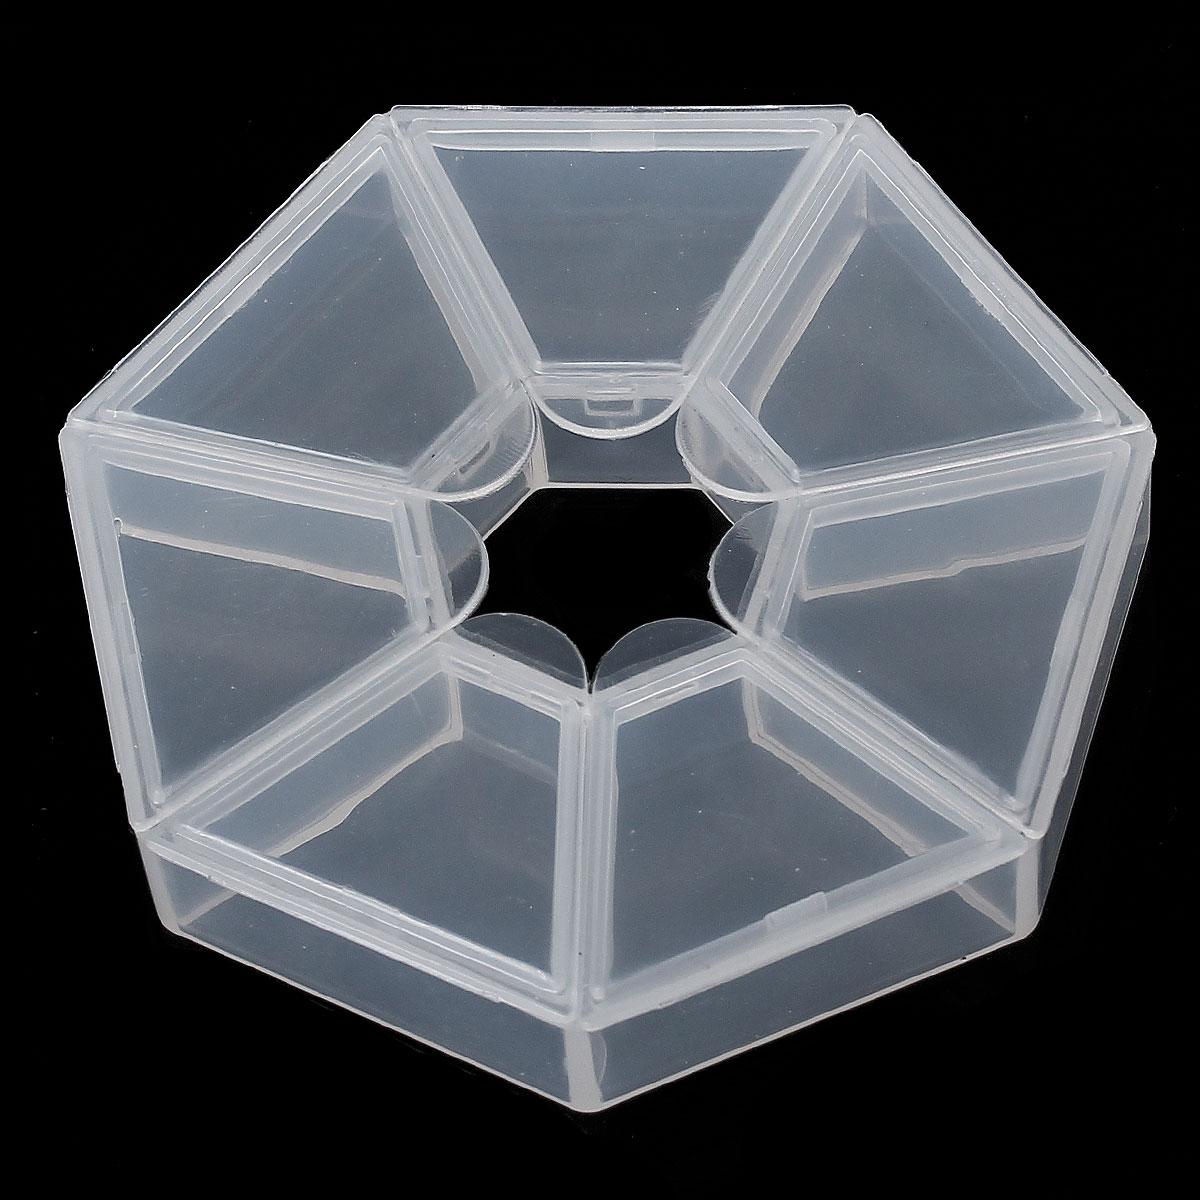 Heptagon Doreen Box Plastic Bea...